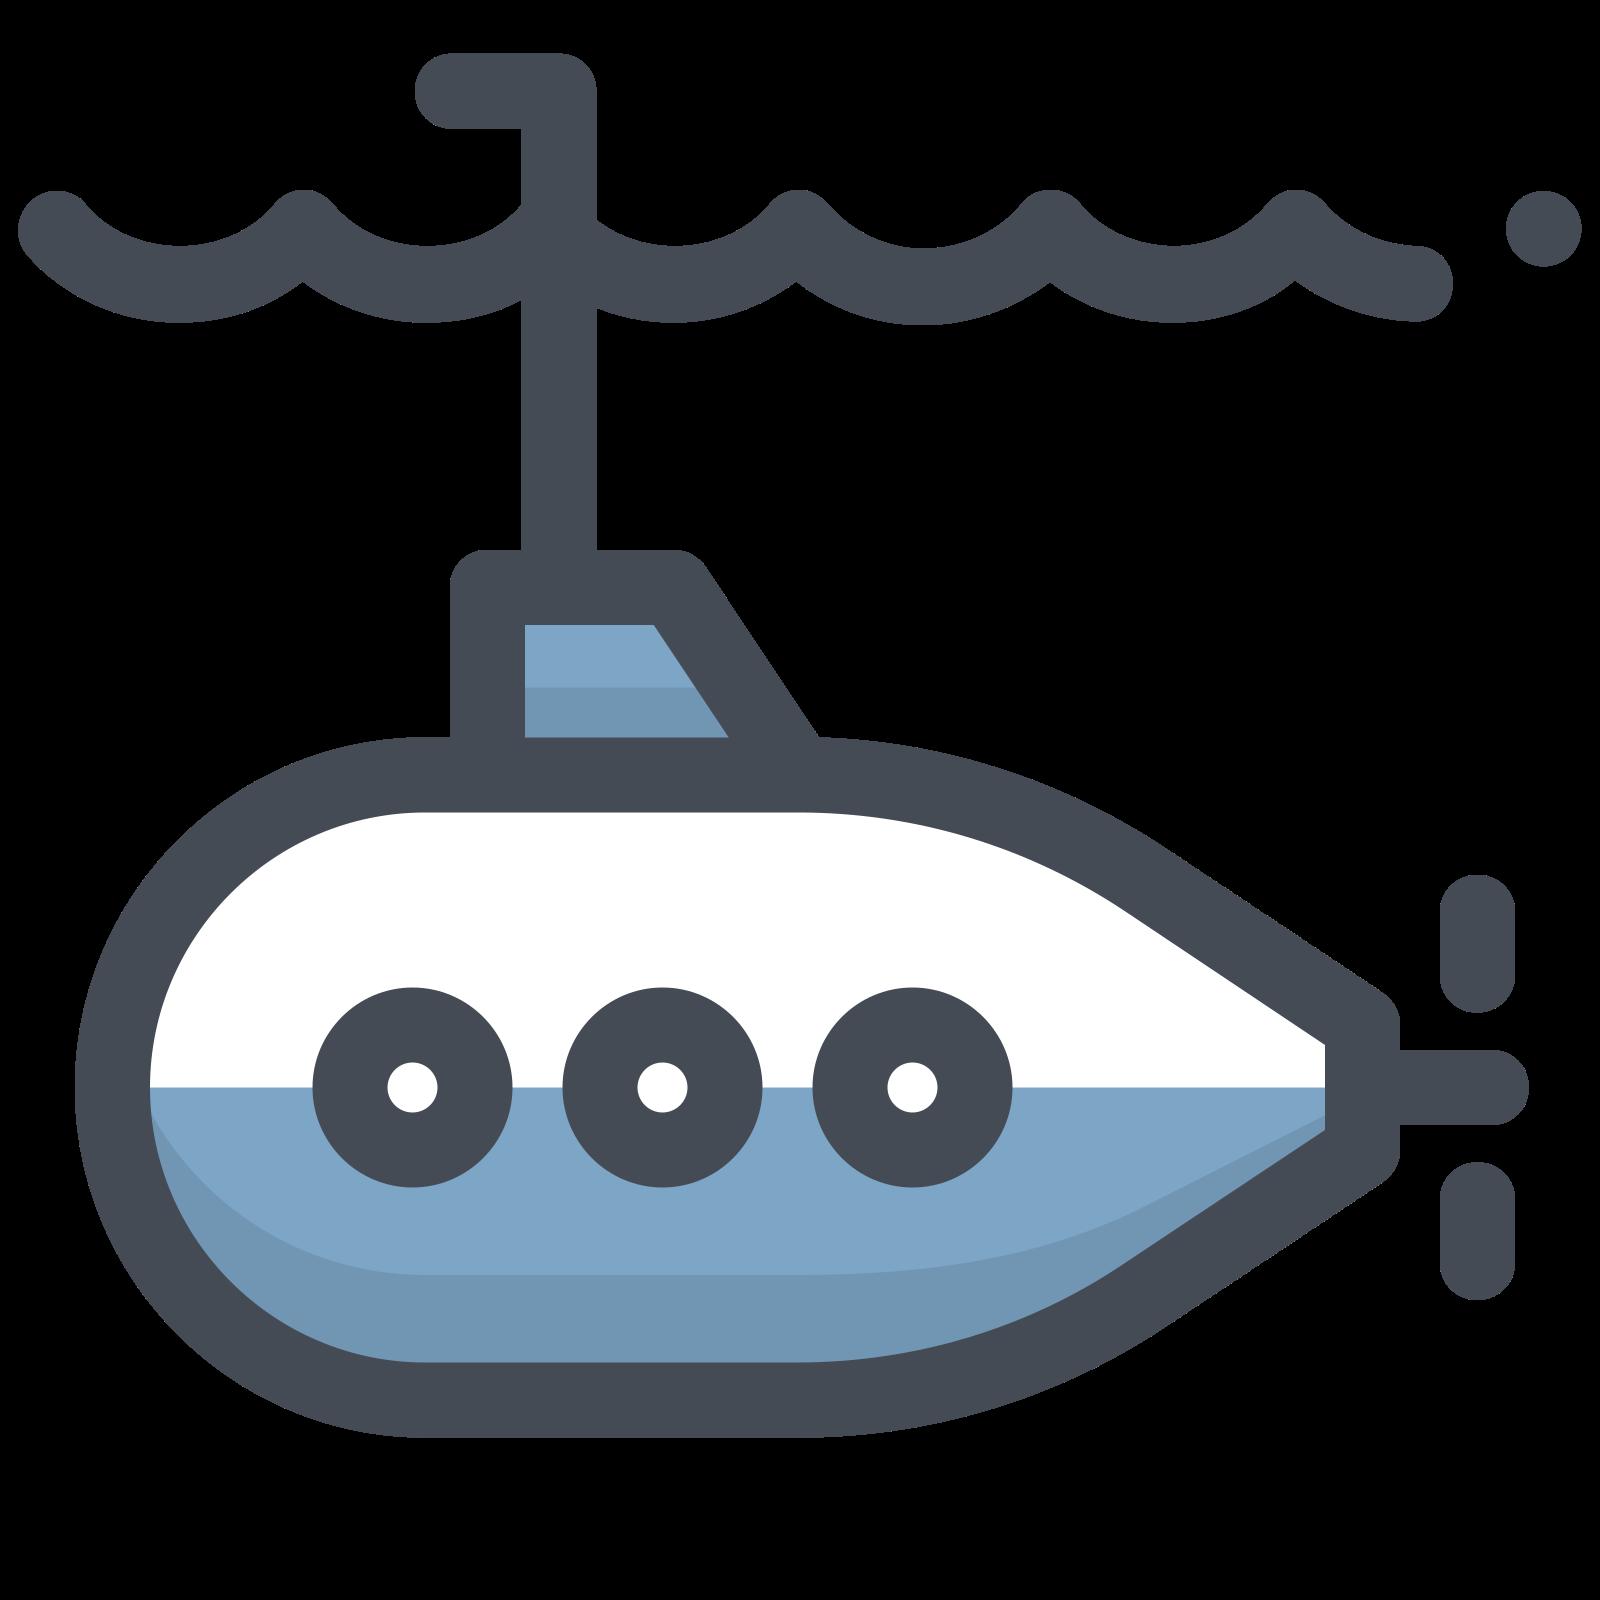 Łódź podwodna icon